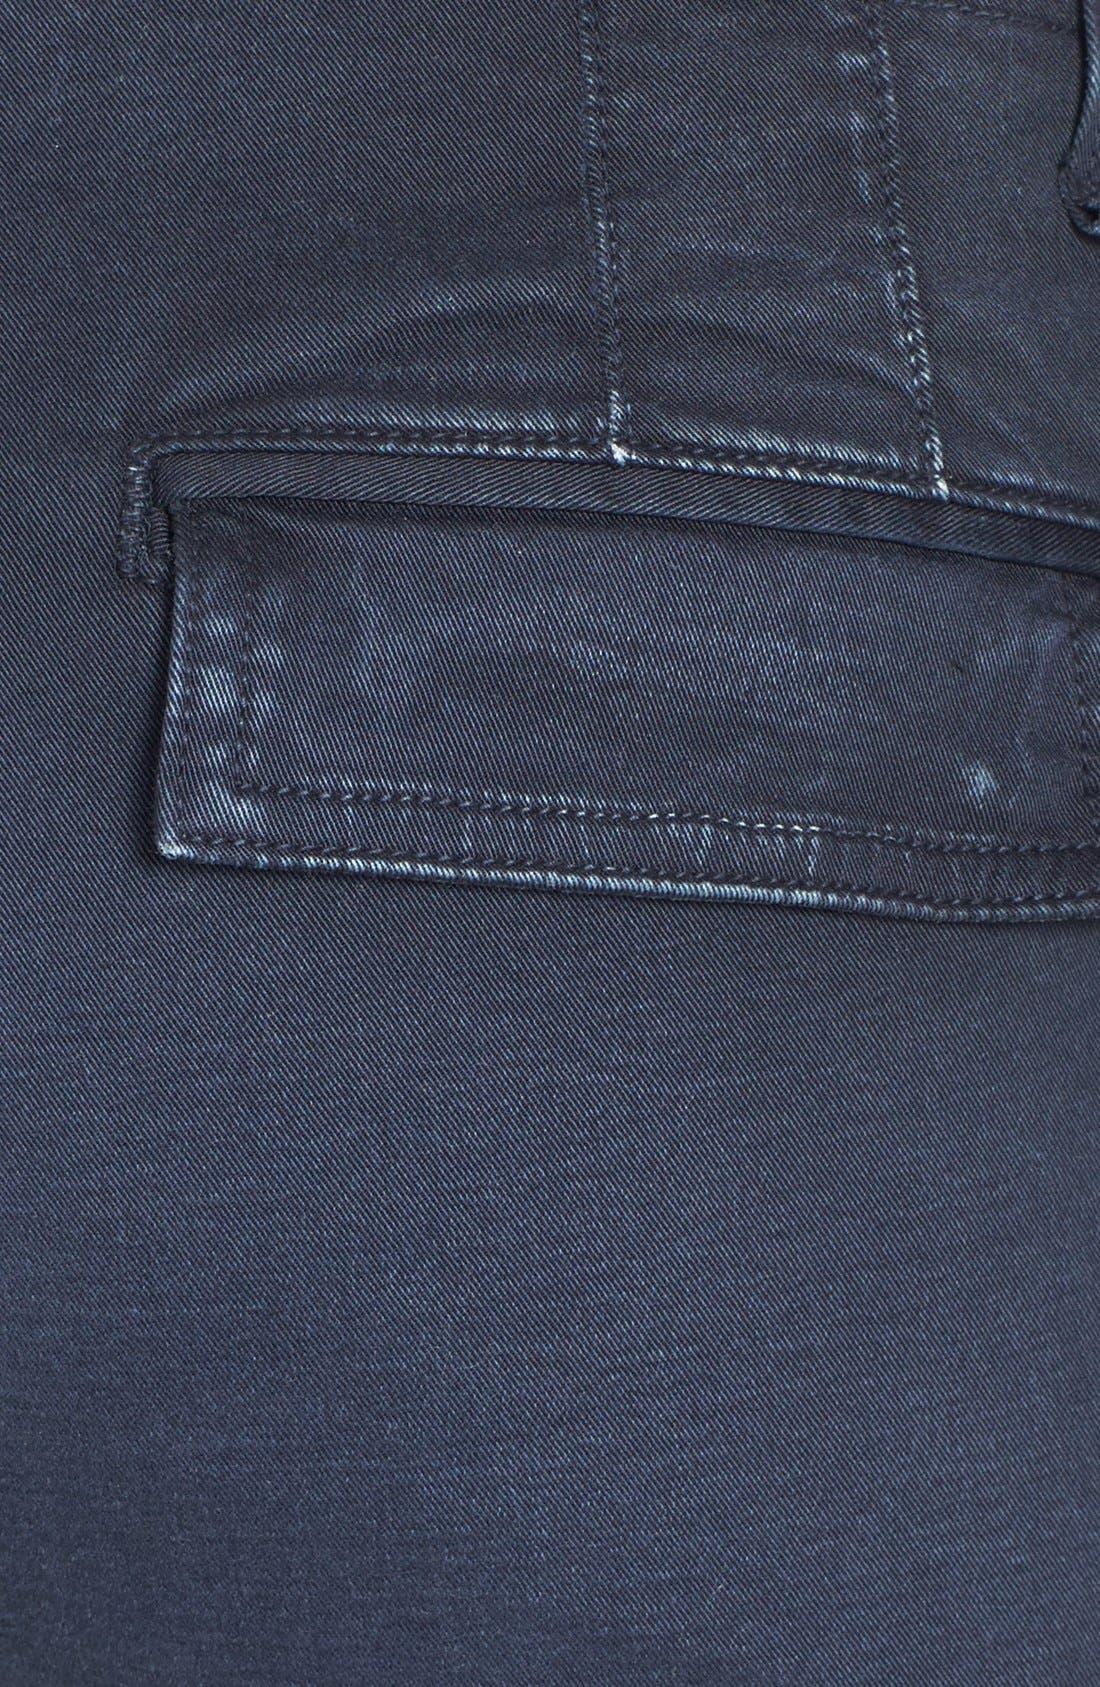 Alternate Image 3  - rag & bone/JEAN 'Bowery' Cargo Skinny Jeans (Distressed Navy)